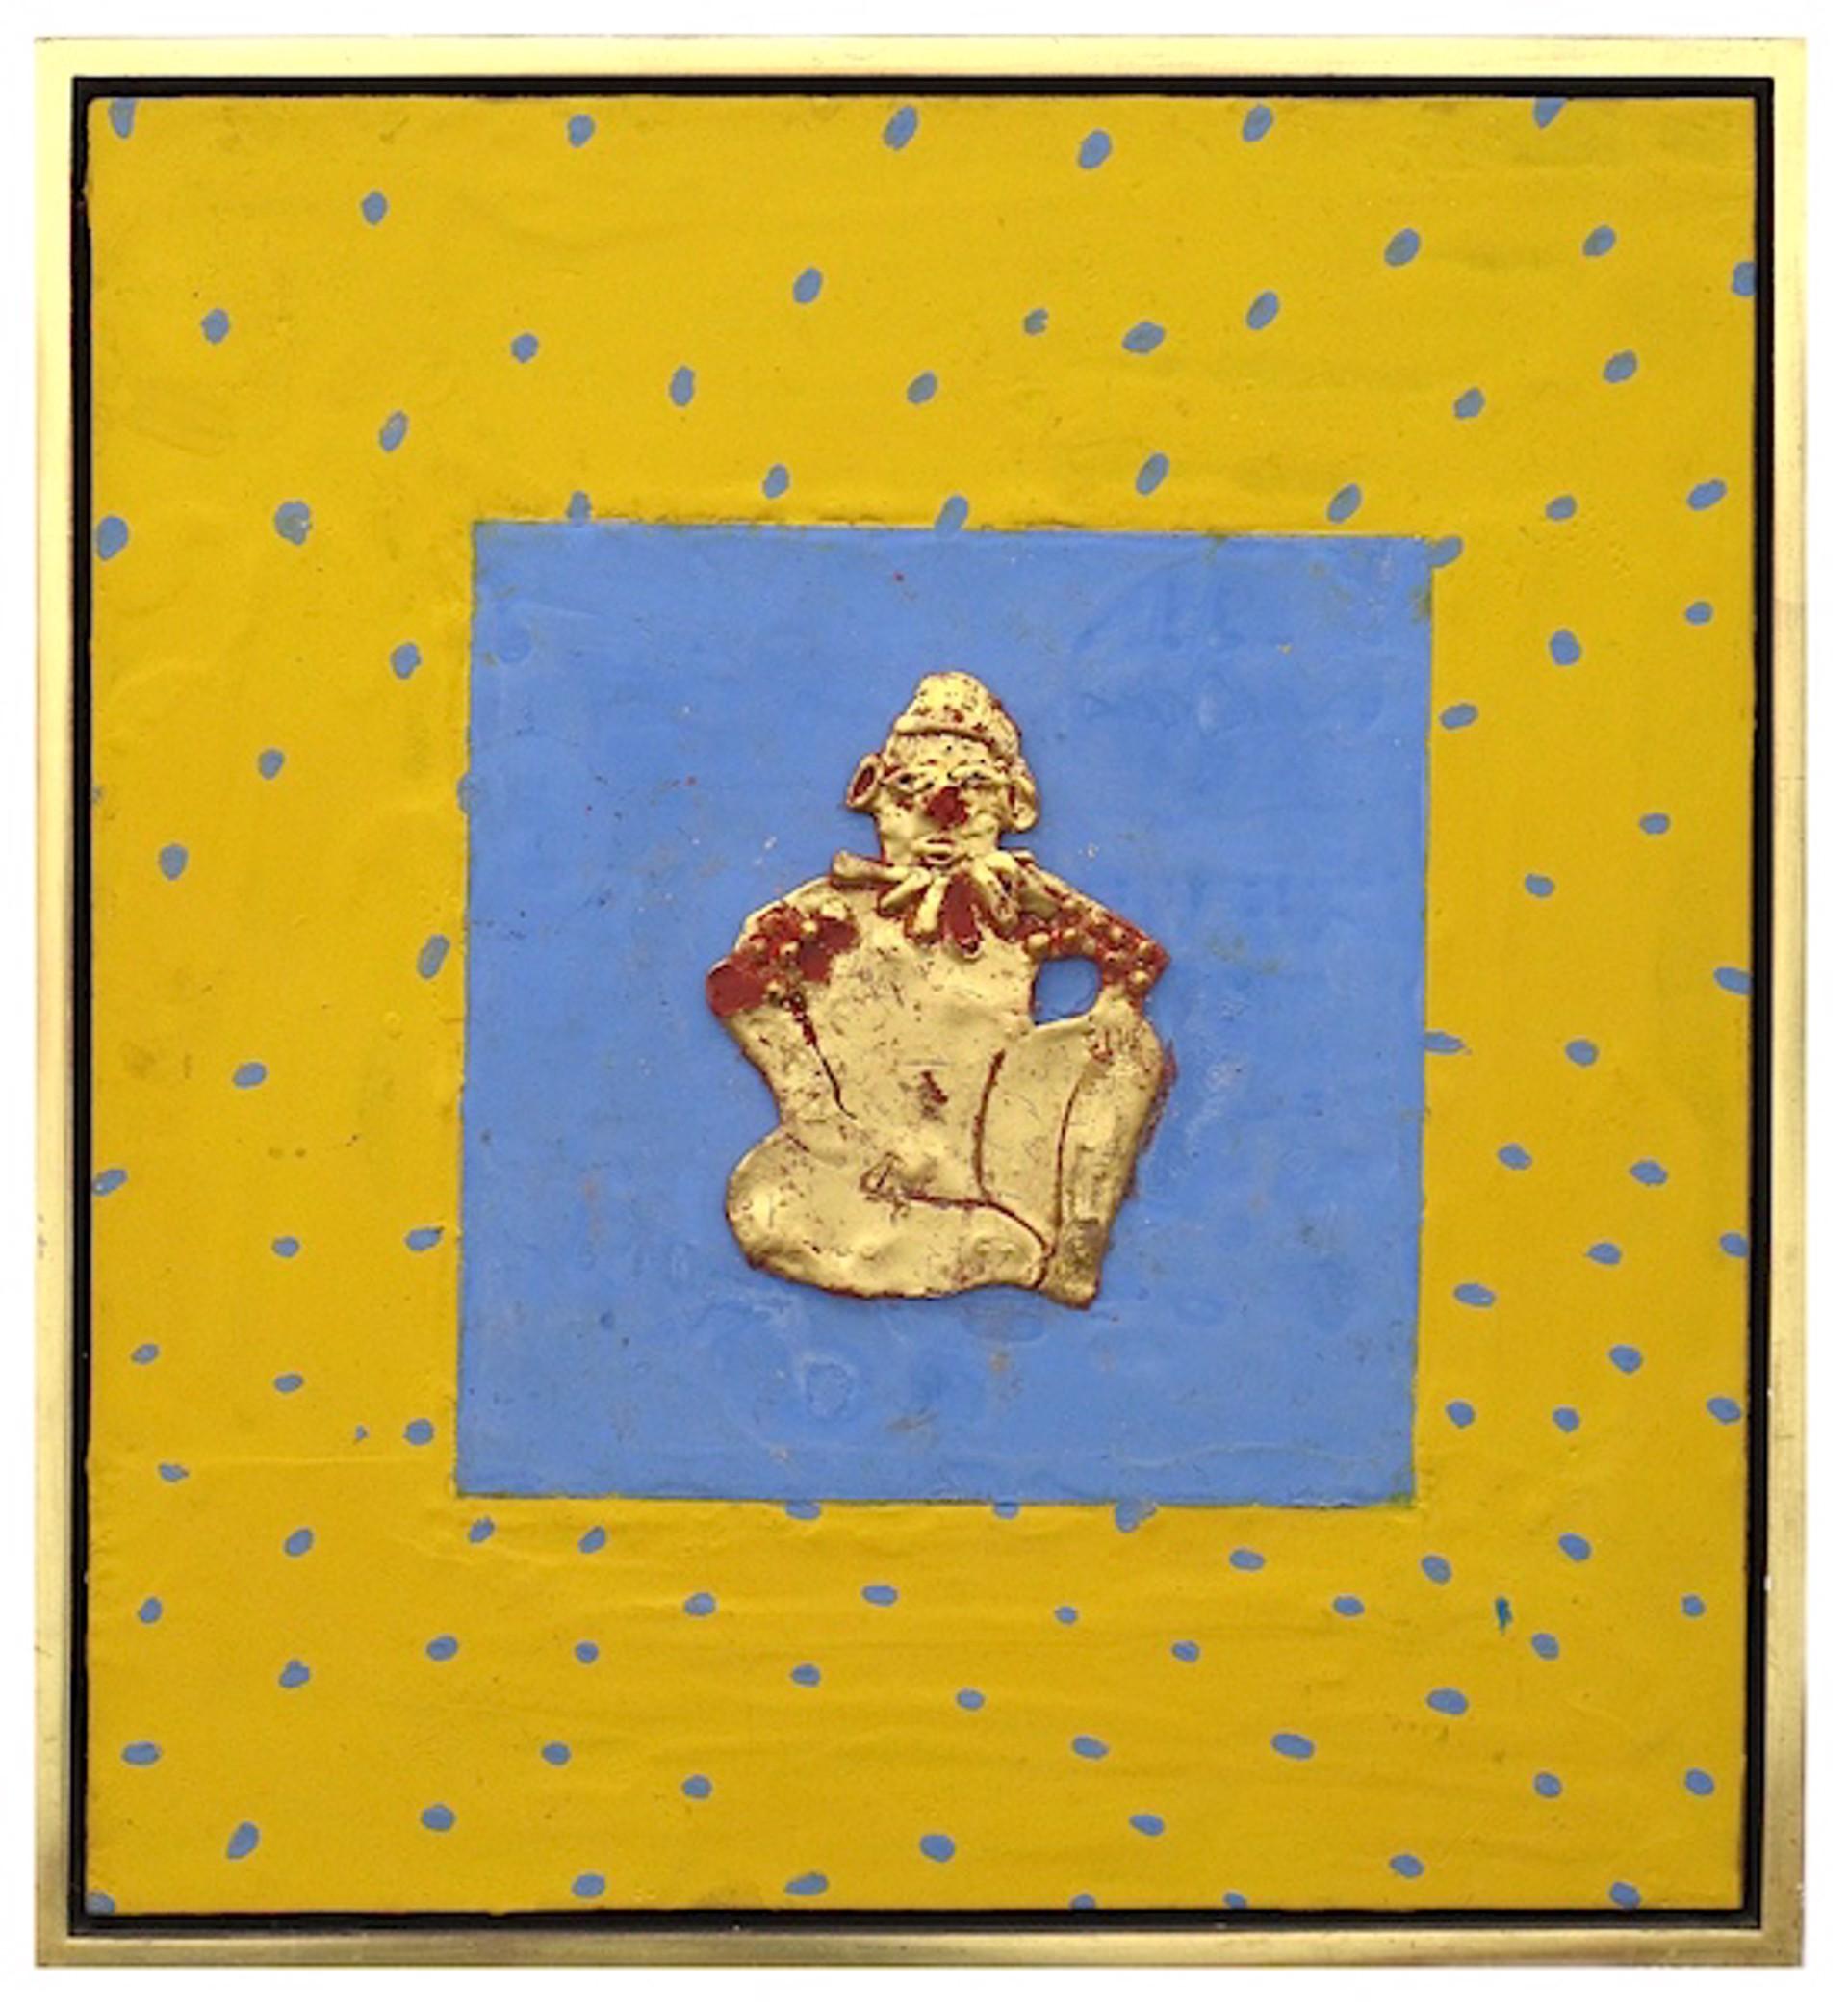 Gold Artifact by James Havard